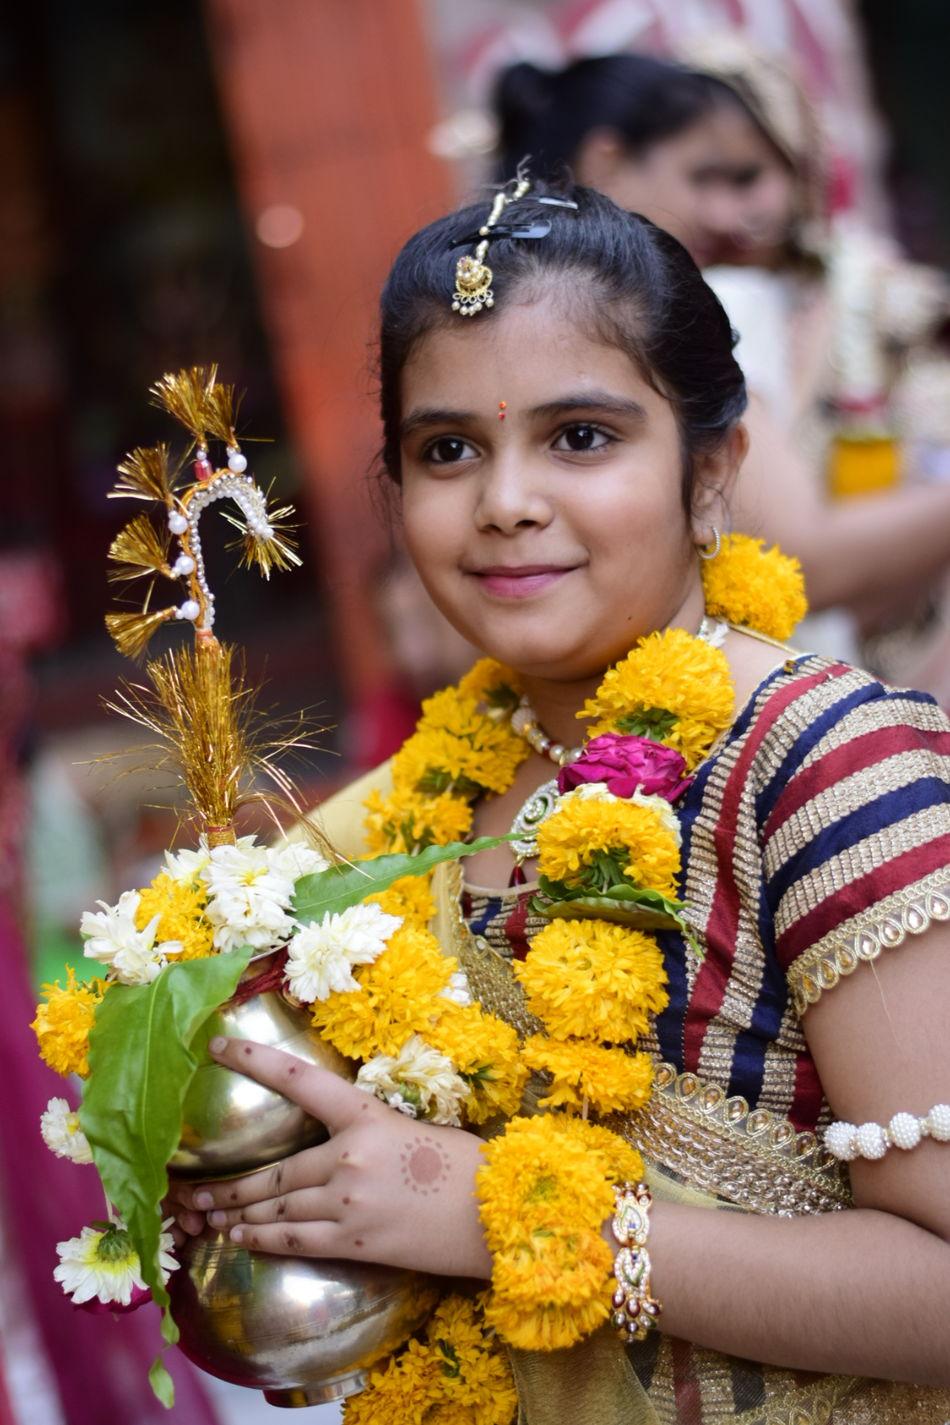 Women Who Inspire You Jodhpur Local Festival Beautiful Girl Photography Local Culture Likeforlike Capture Taking Photos